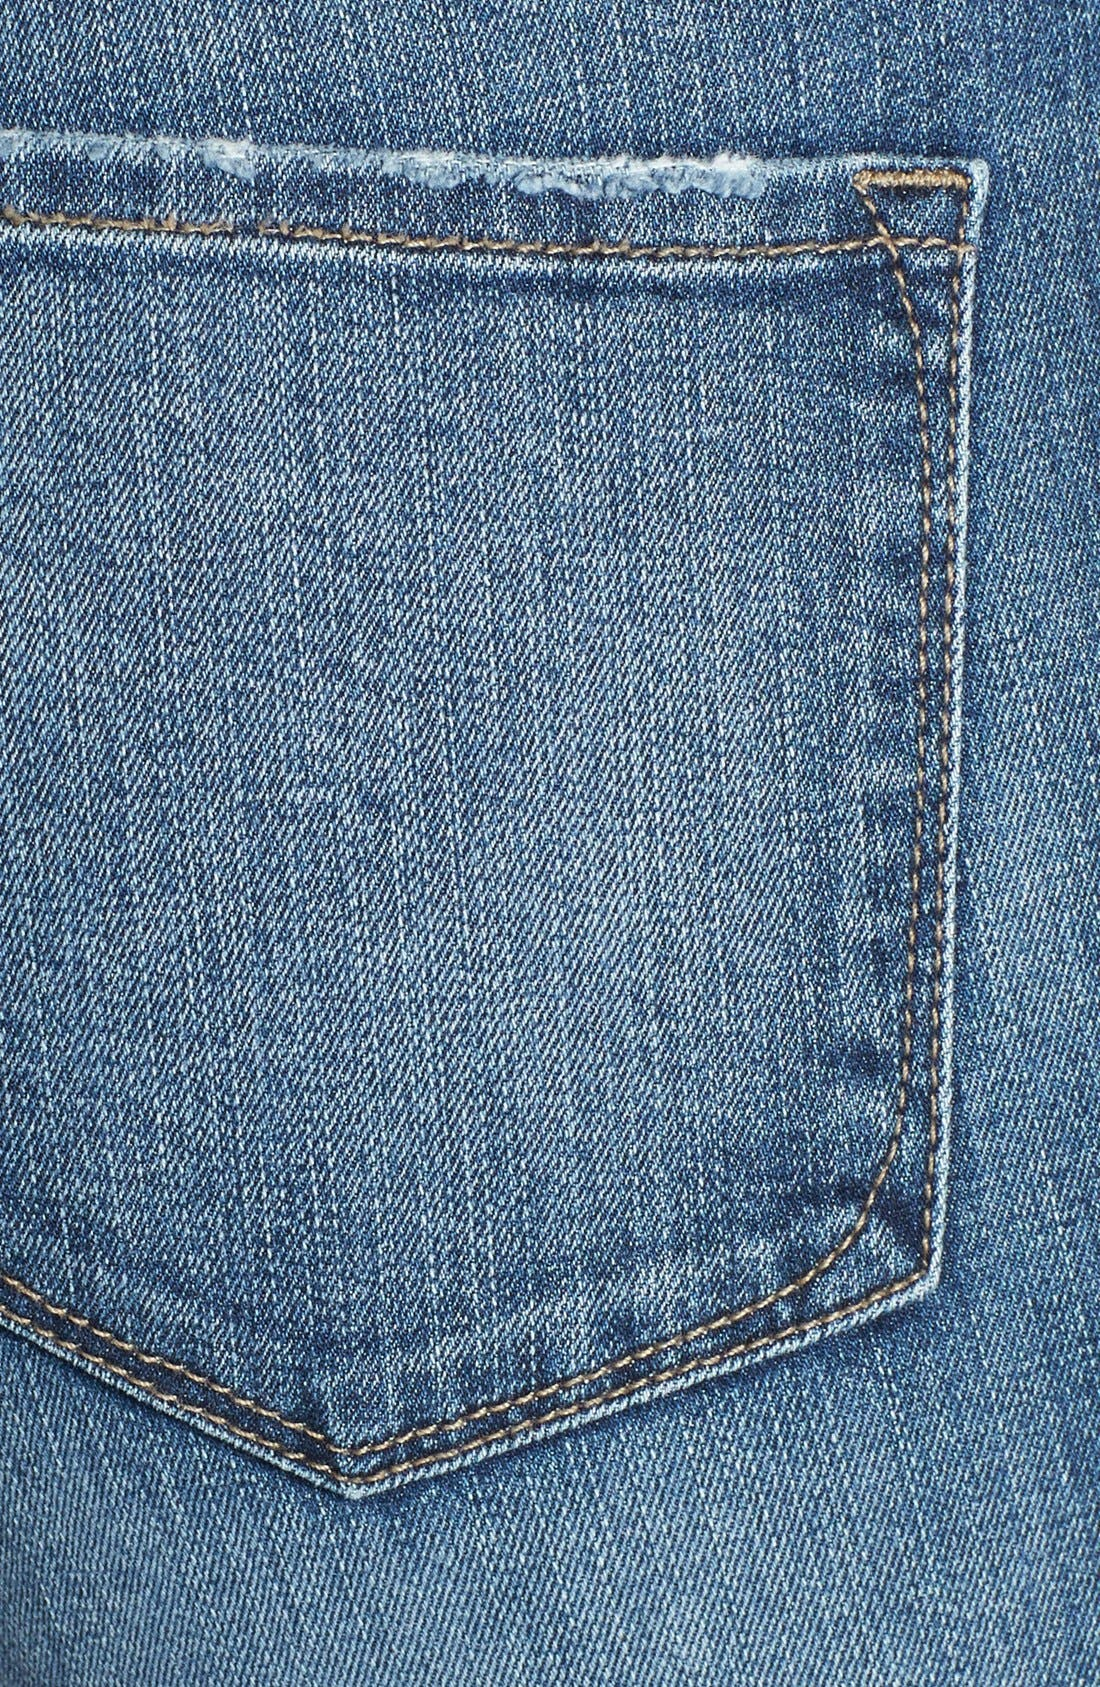 Alternate Image 3  - NYDJ 'Leann' Stretch Boyfriend Jeans (Durham)